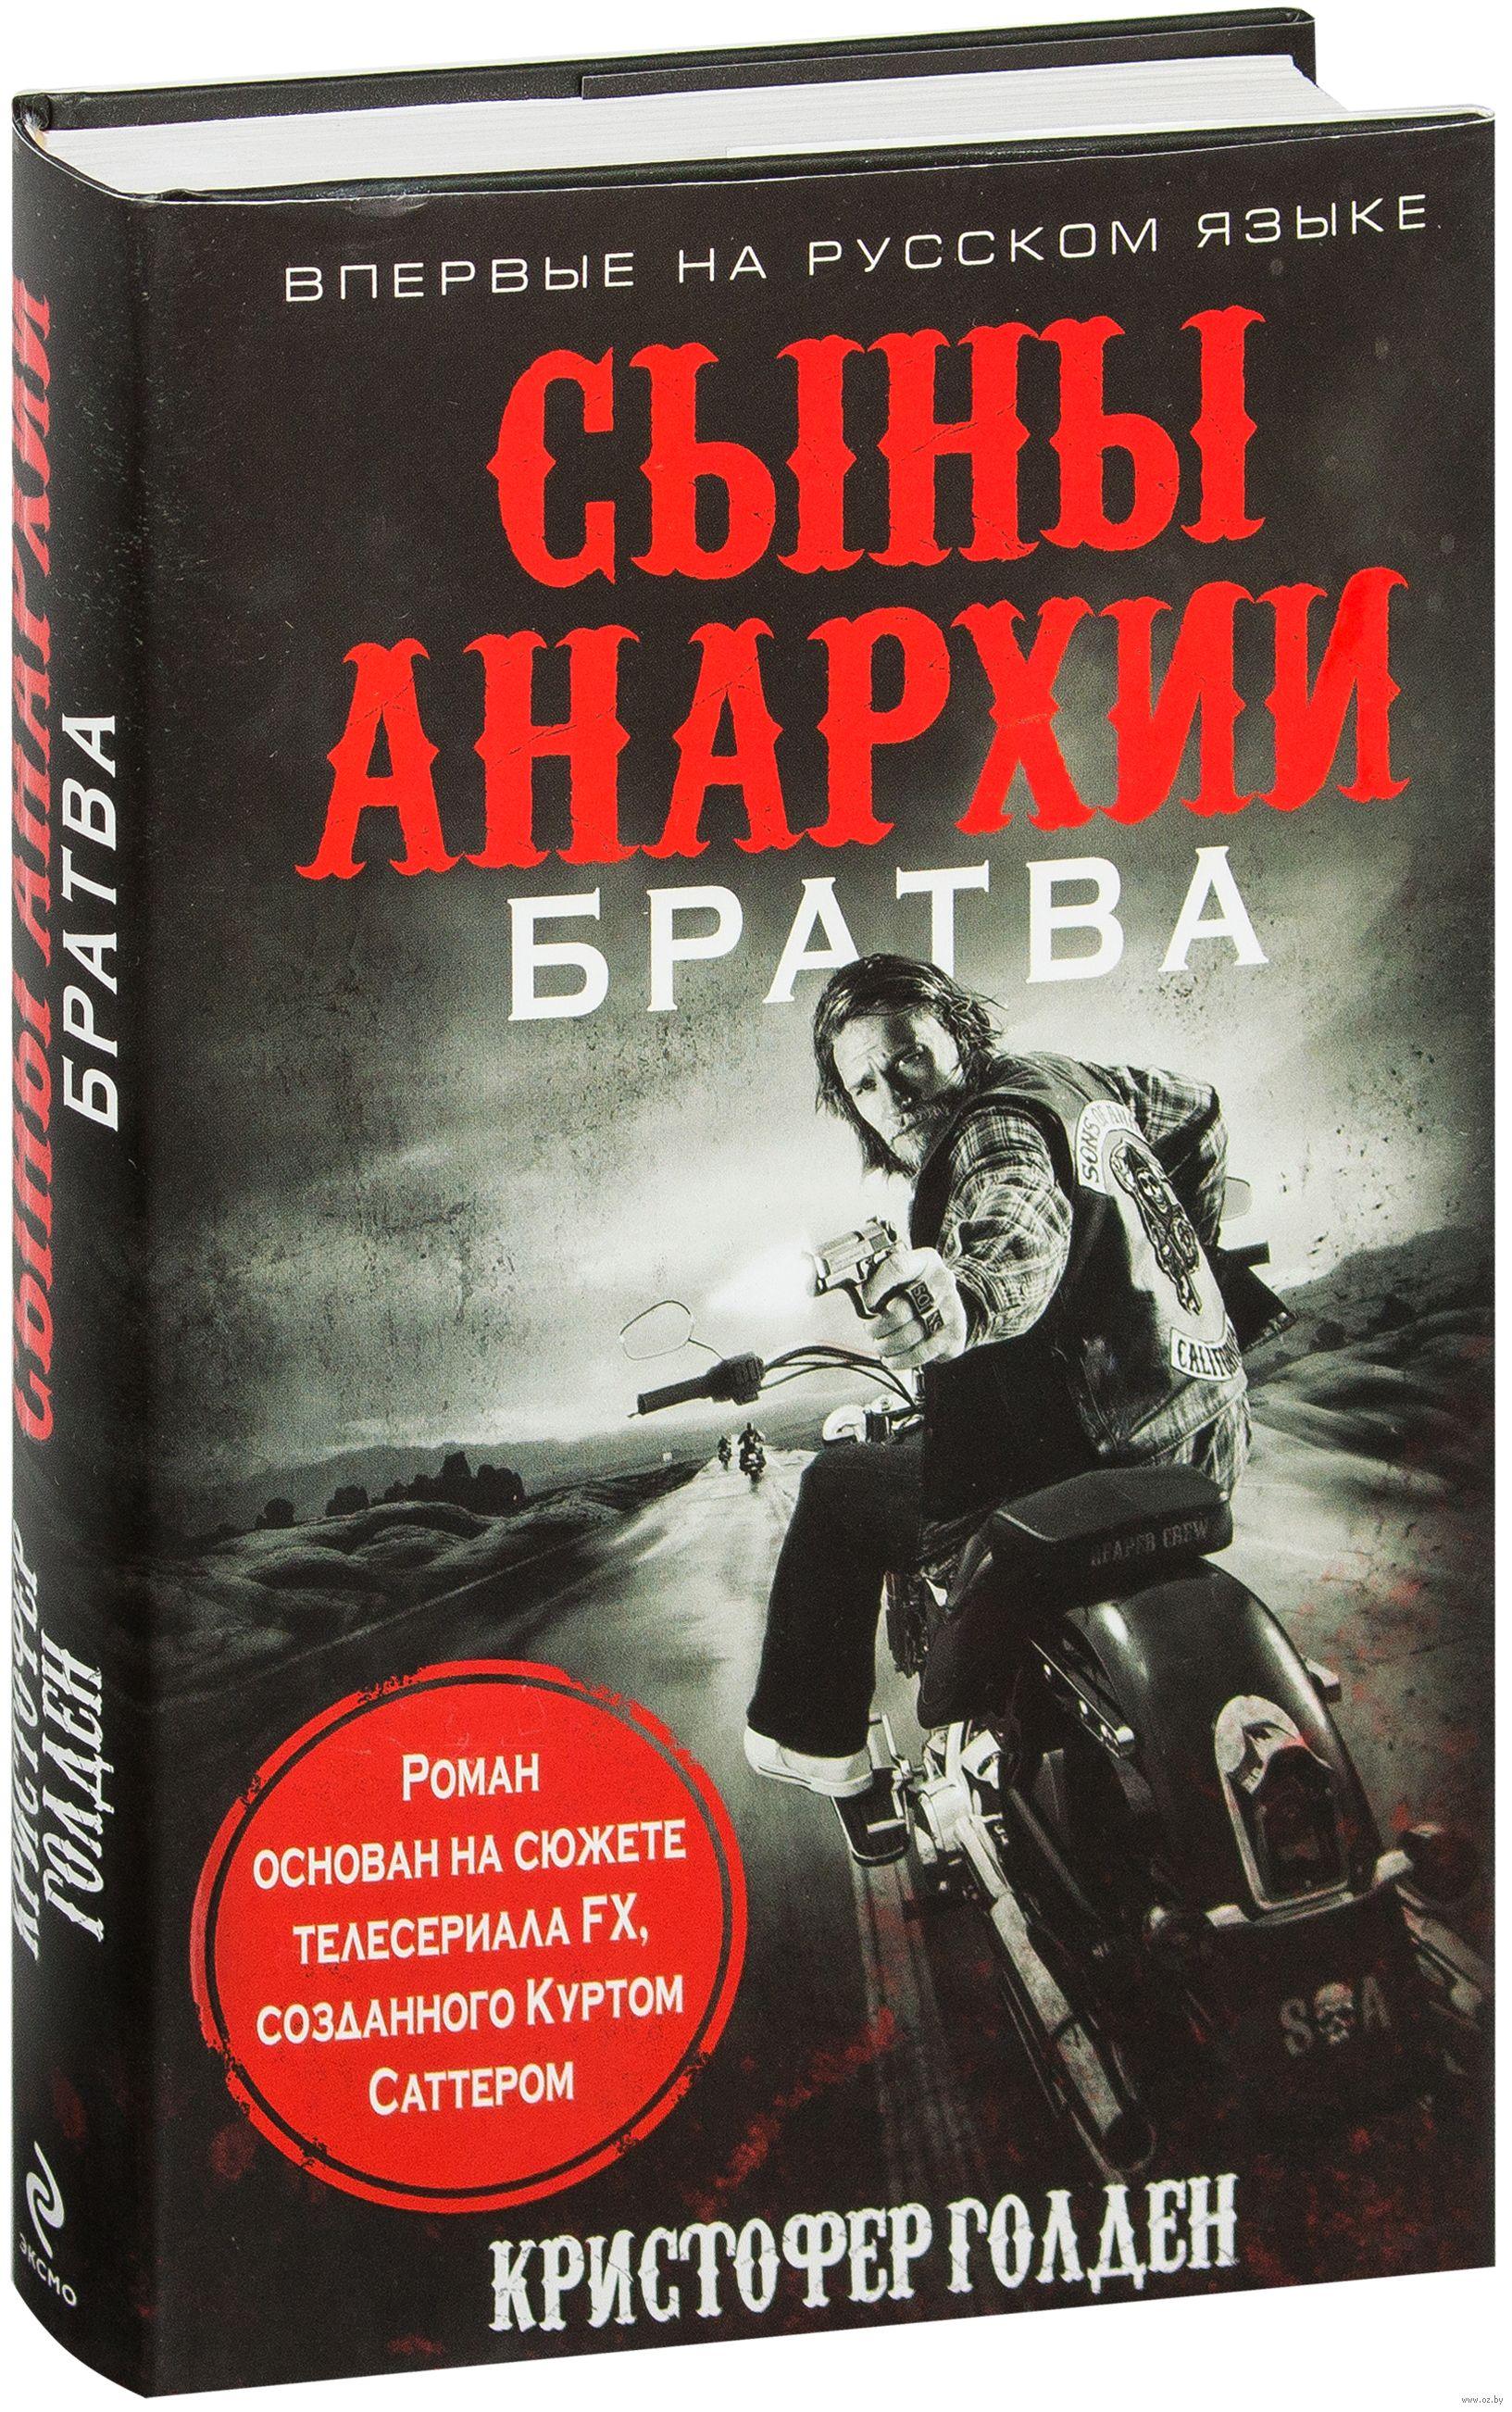 28decc43 Сыны анархии. Братва» Кристофер Голден - купить книгу «Сыны анархии ...